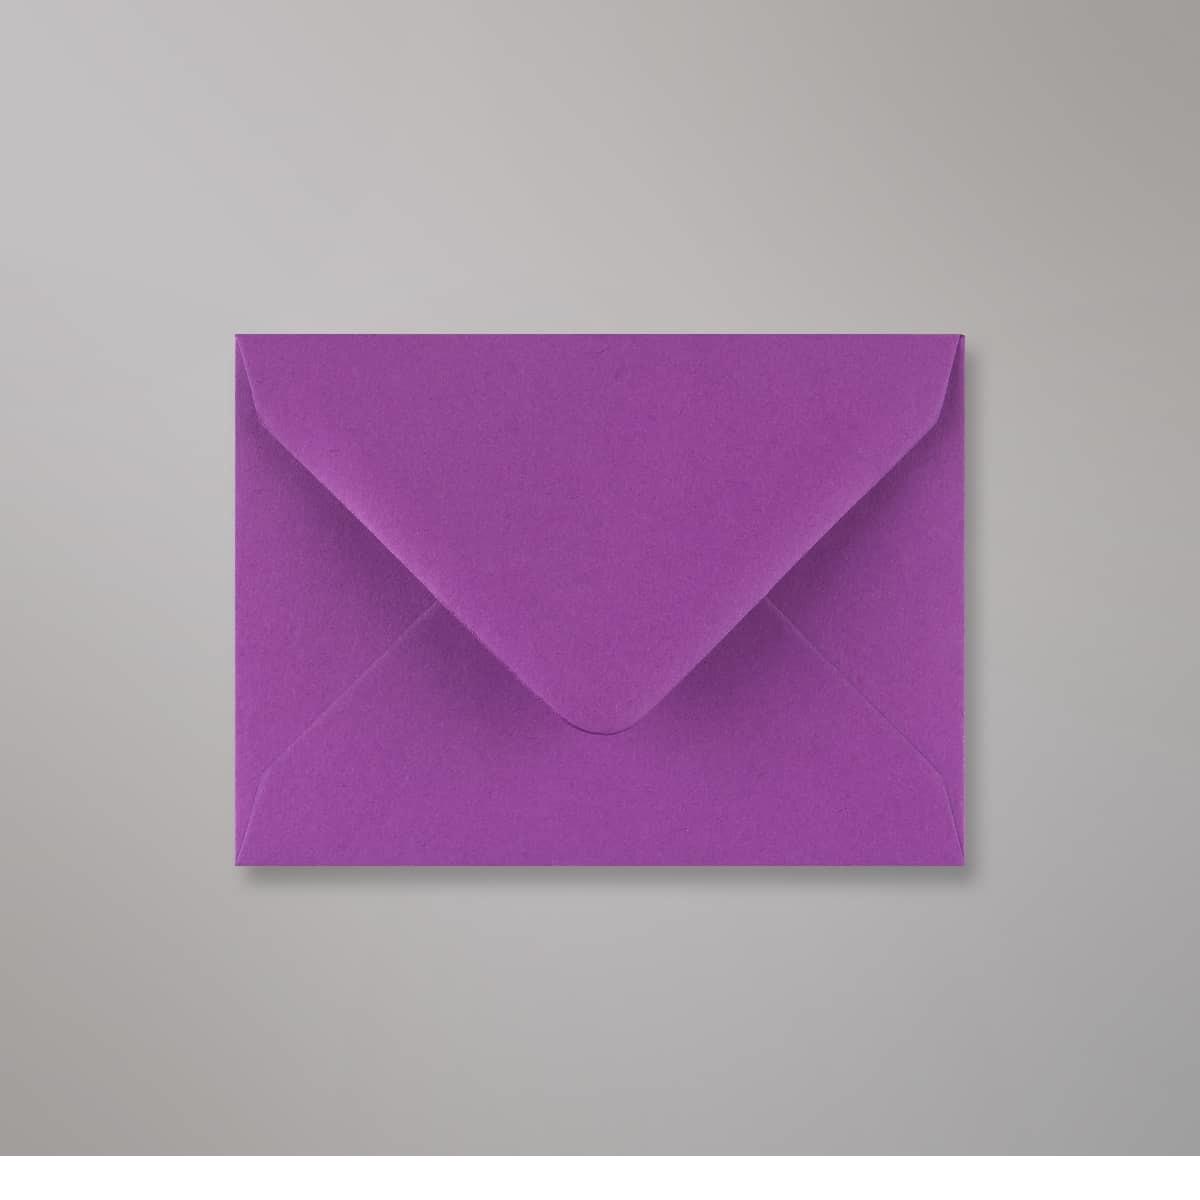 Enveloppe violette 82x113 mm (C7)